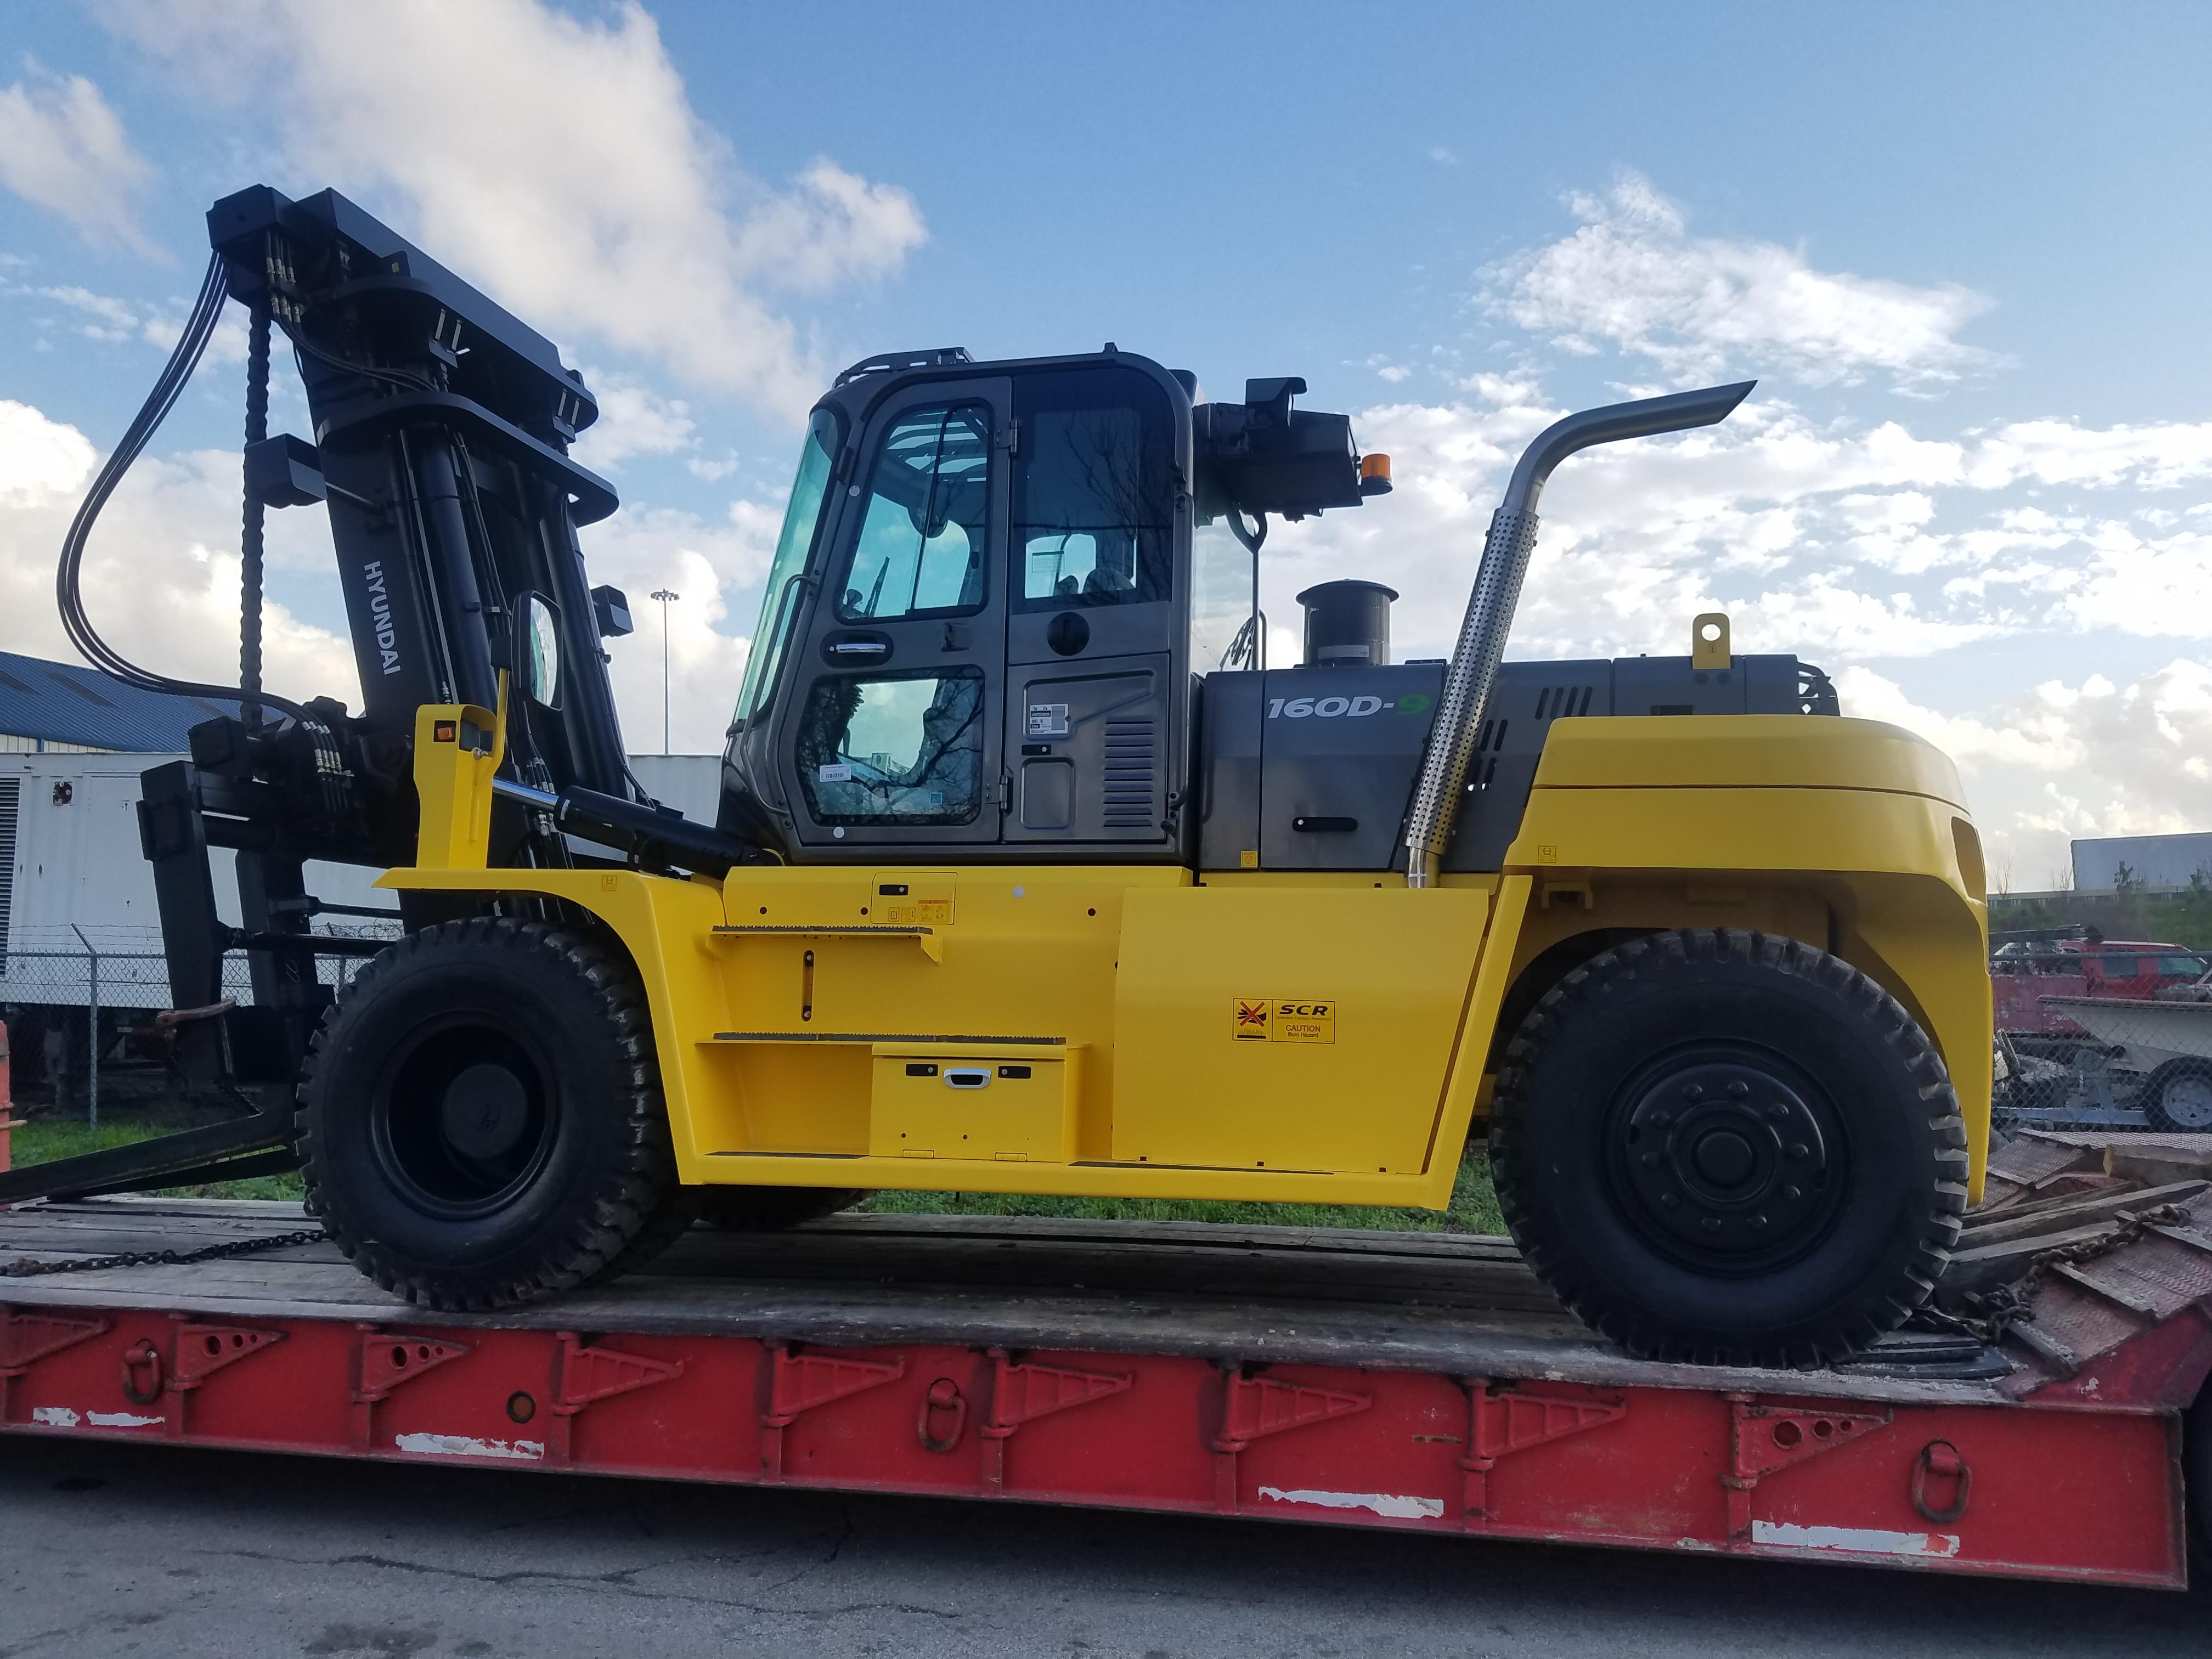 Used, 2018, Hyundai, 160D, Forklifts / Lift Trucks